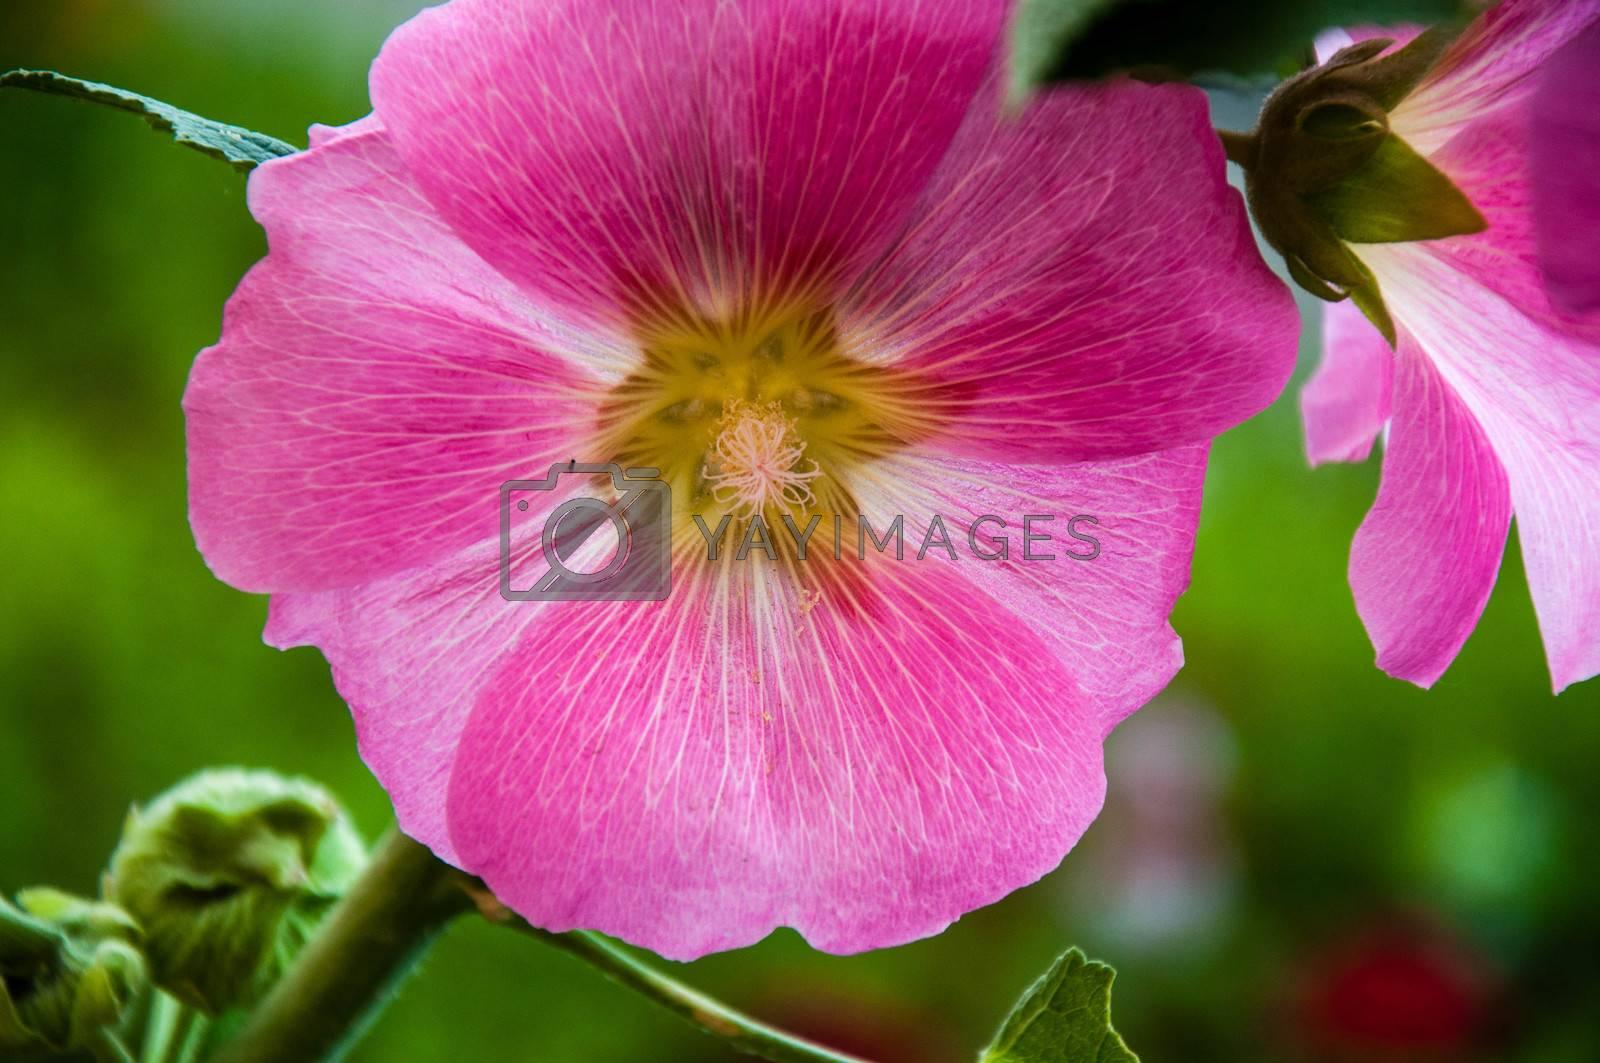 Malva Flower Pink color in spring morning